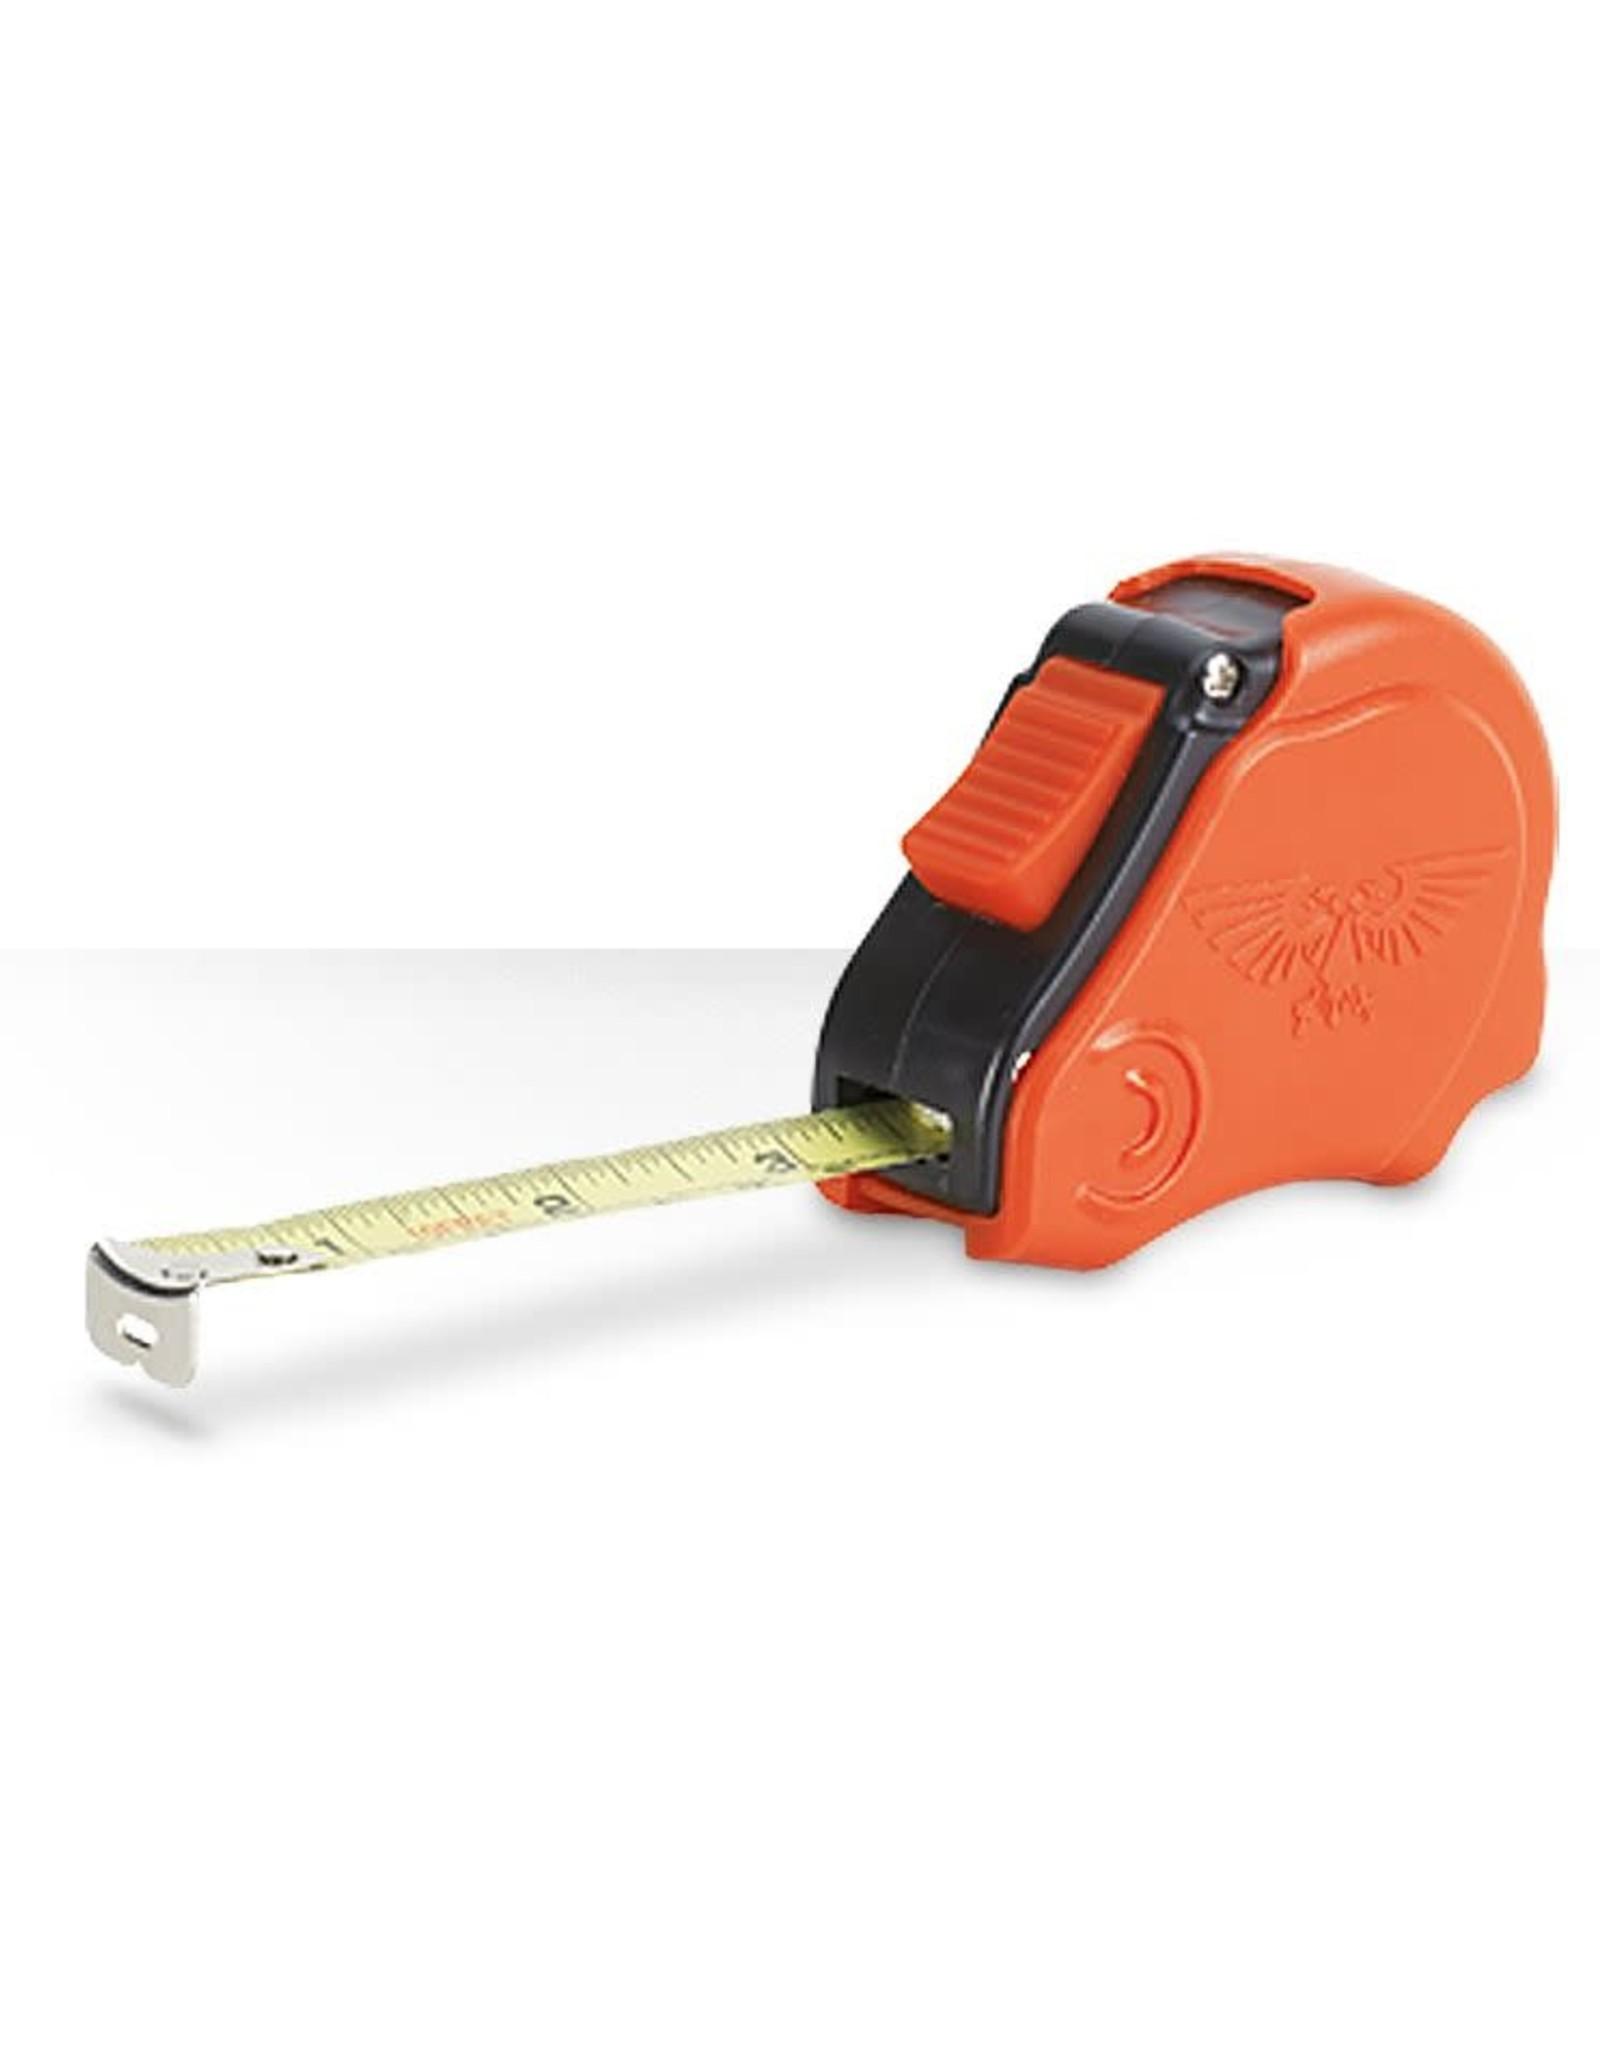 GW Tape Measure Red Orange